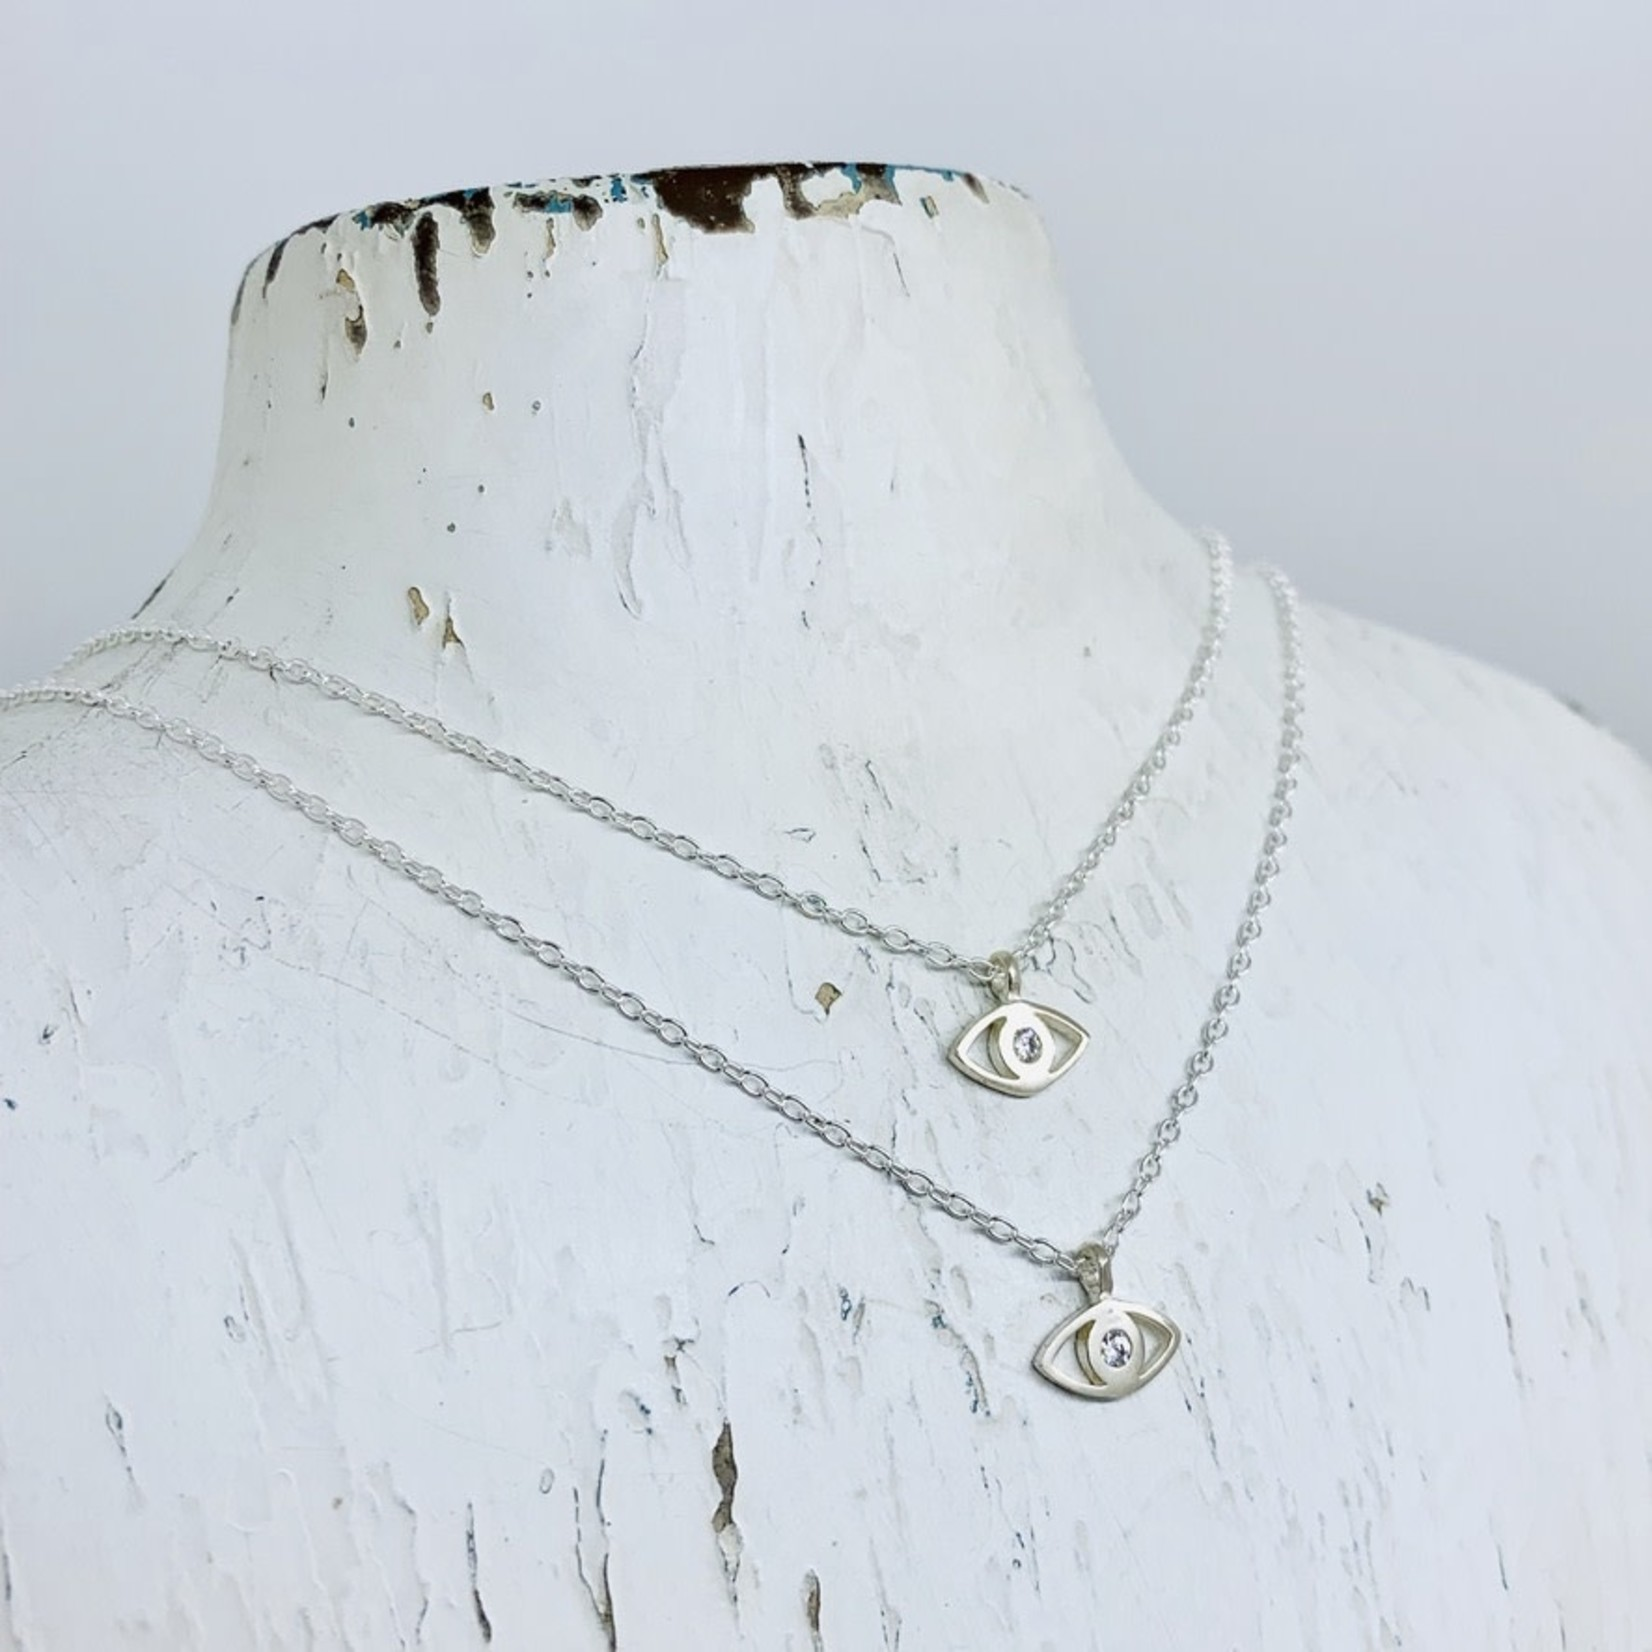 Locally Handmade Evil Eye w/ White Topaz Necklace, Sterling Silver